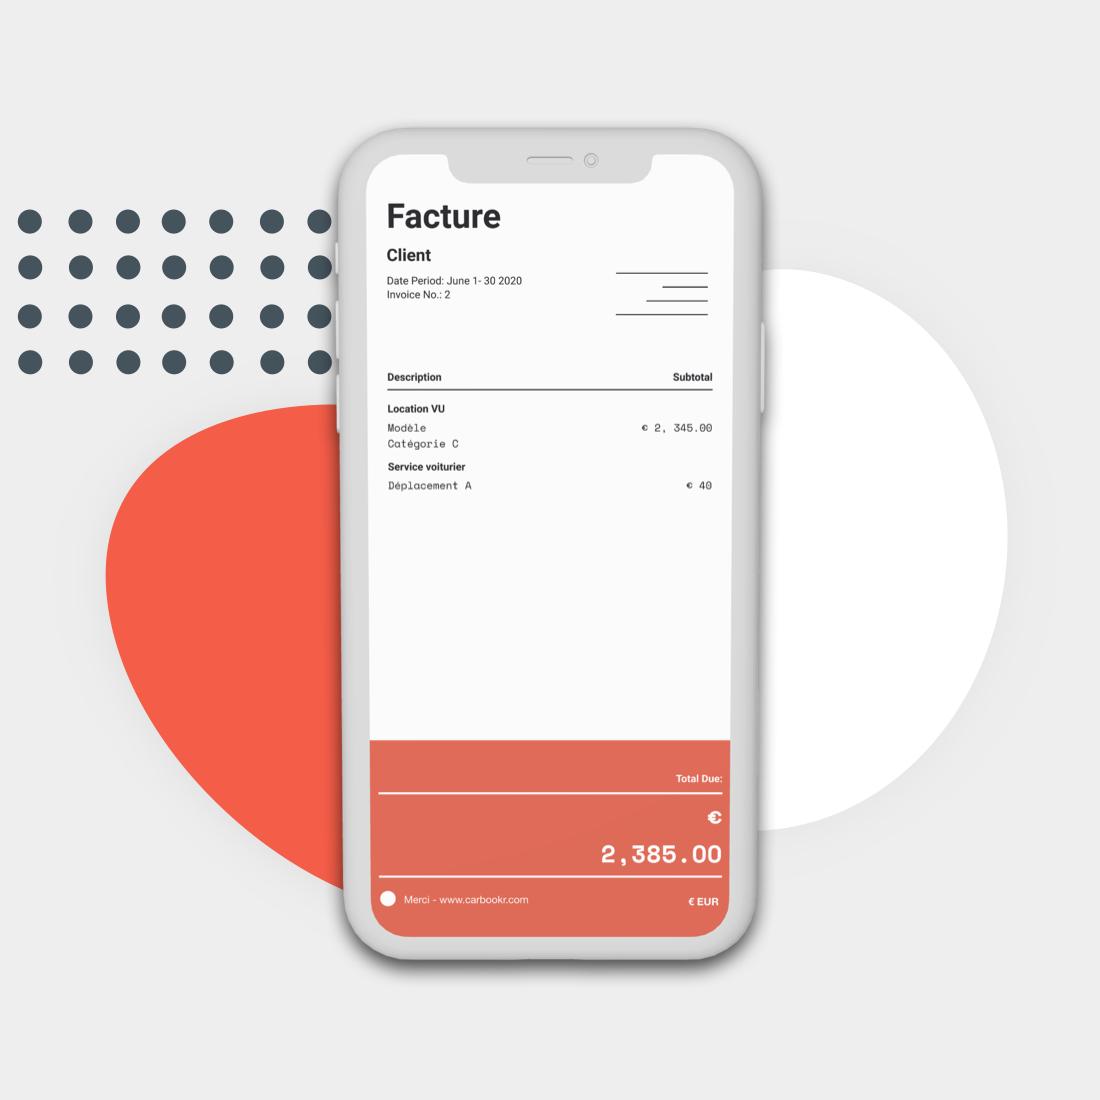 Exemple de facture dans un smartphone